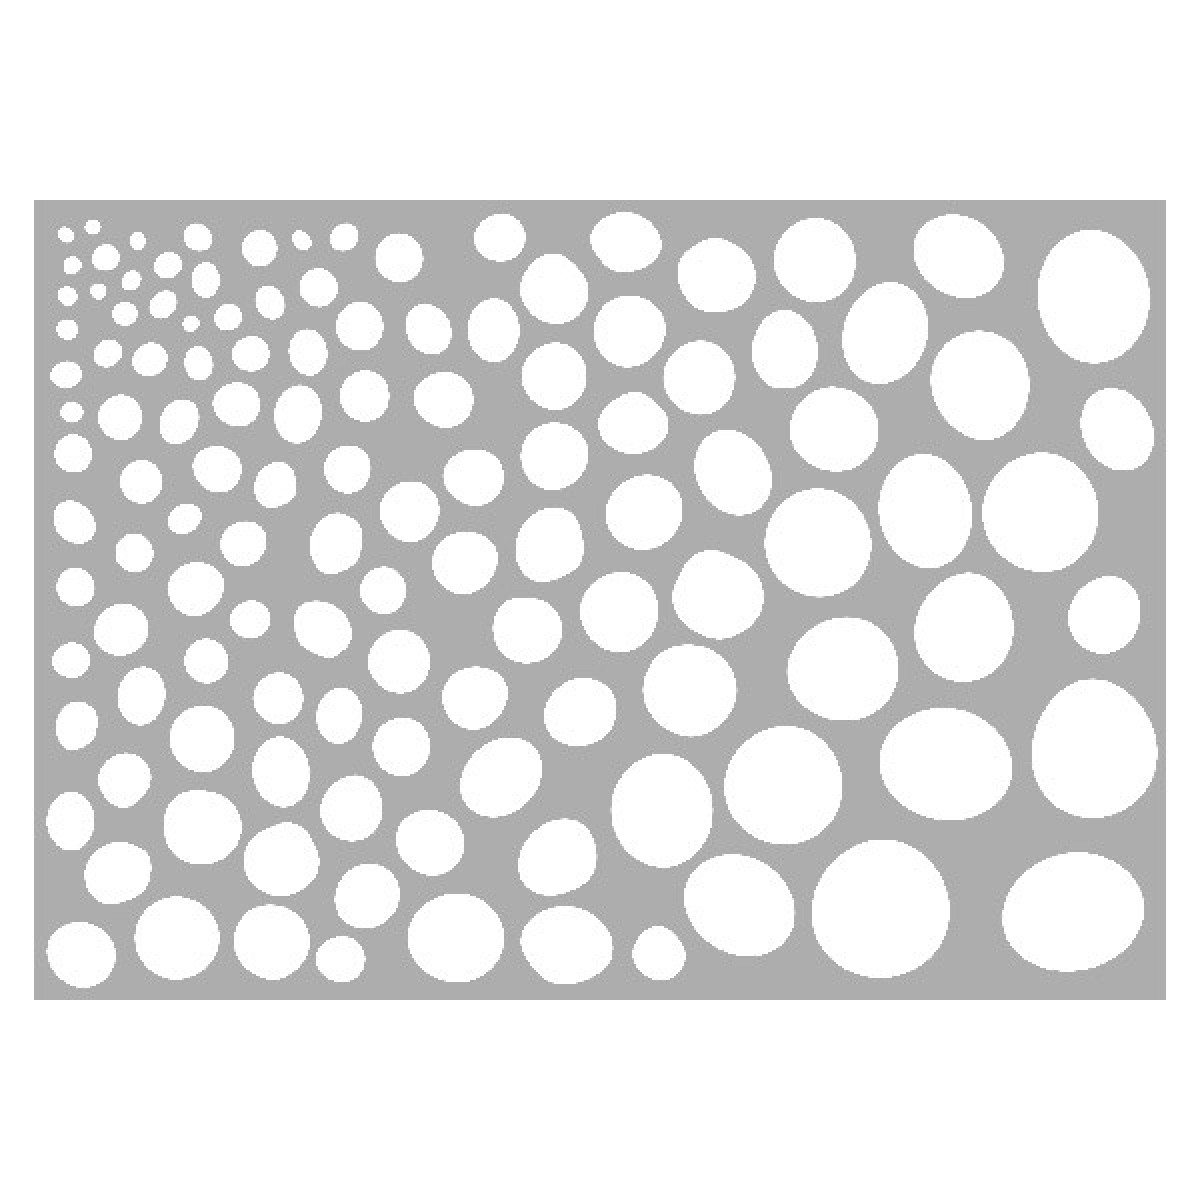 Marabu stencil, A4, Growing Dots